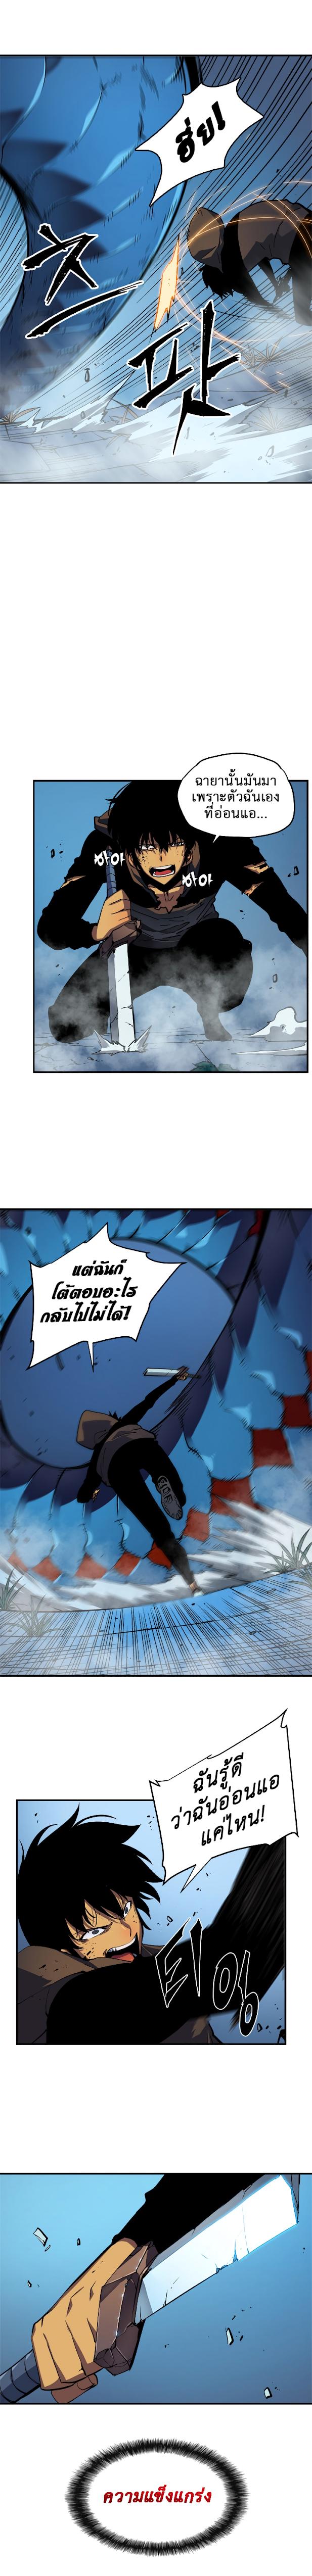 Solo Leveling ตอนที่ 16 TH แปลไทย